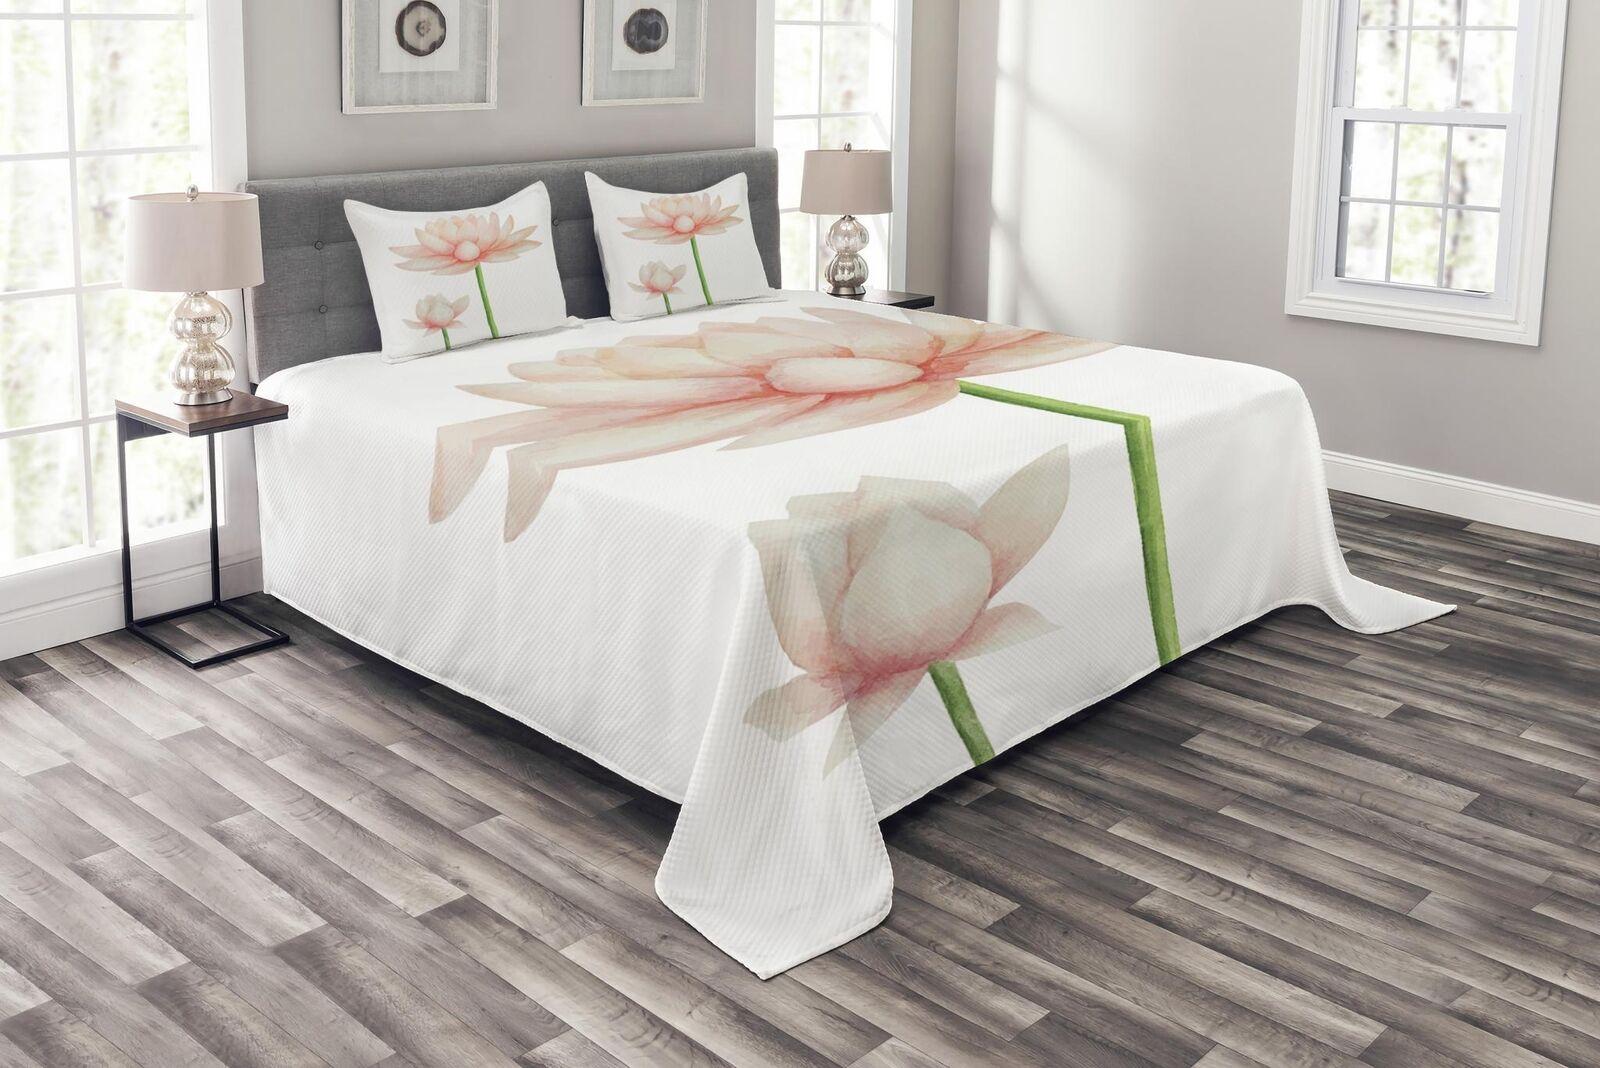 Yoga Quilted Bedspread & Pillow Pillow Pillow Shams Set, Pastel Blooming Lotus Print 0cddaa